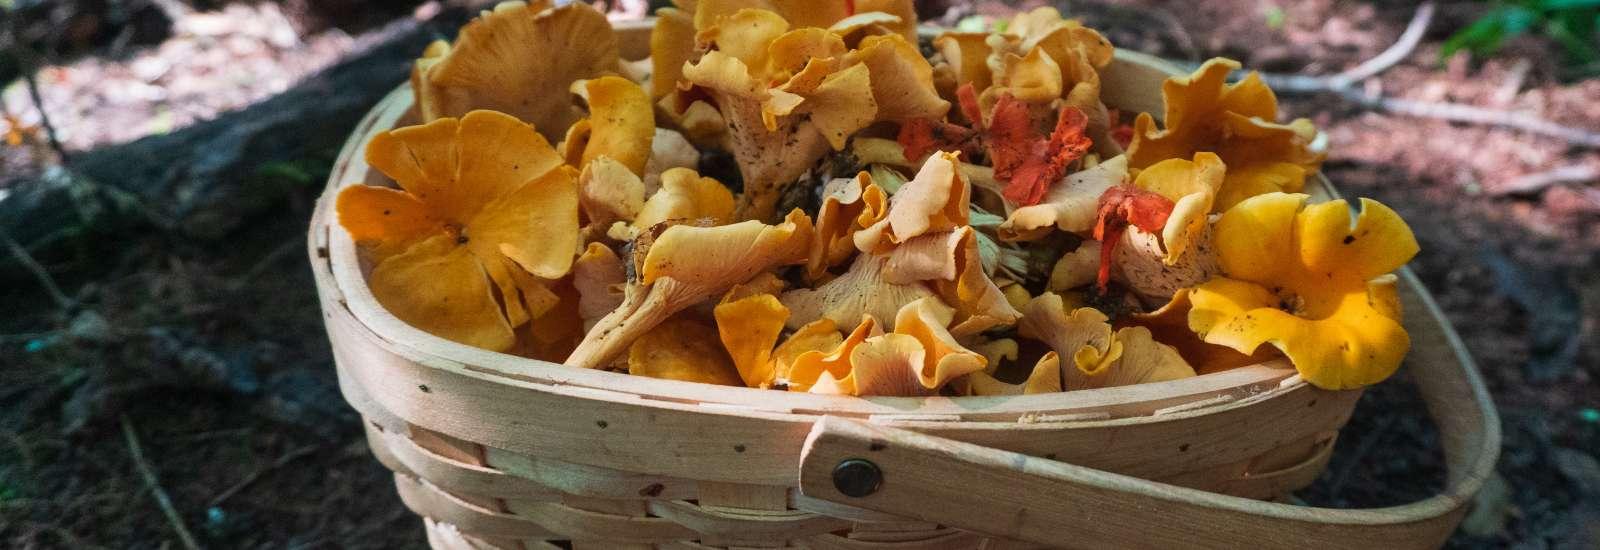 Basket of wild mushrooms